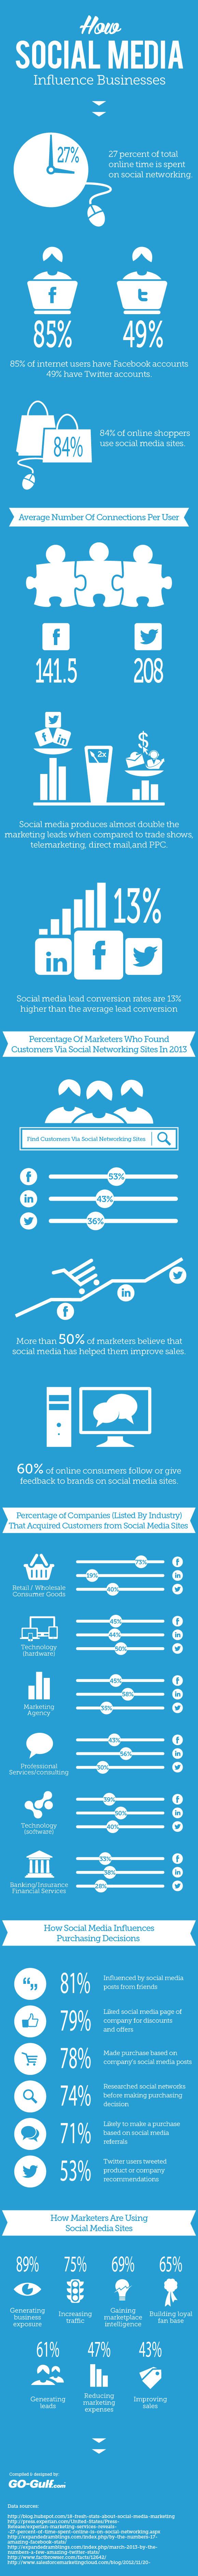 how social media influence businesses